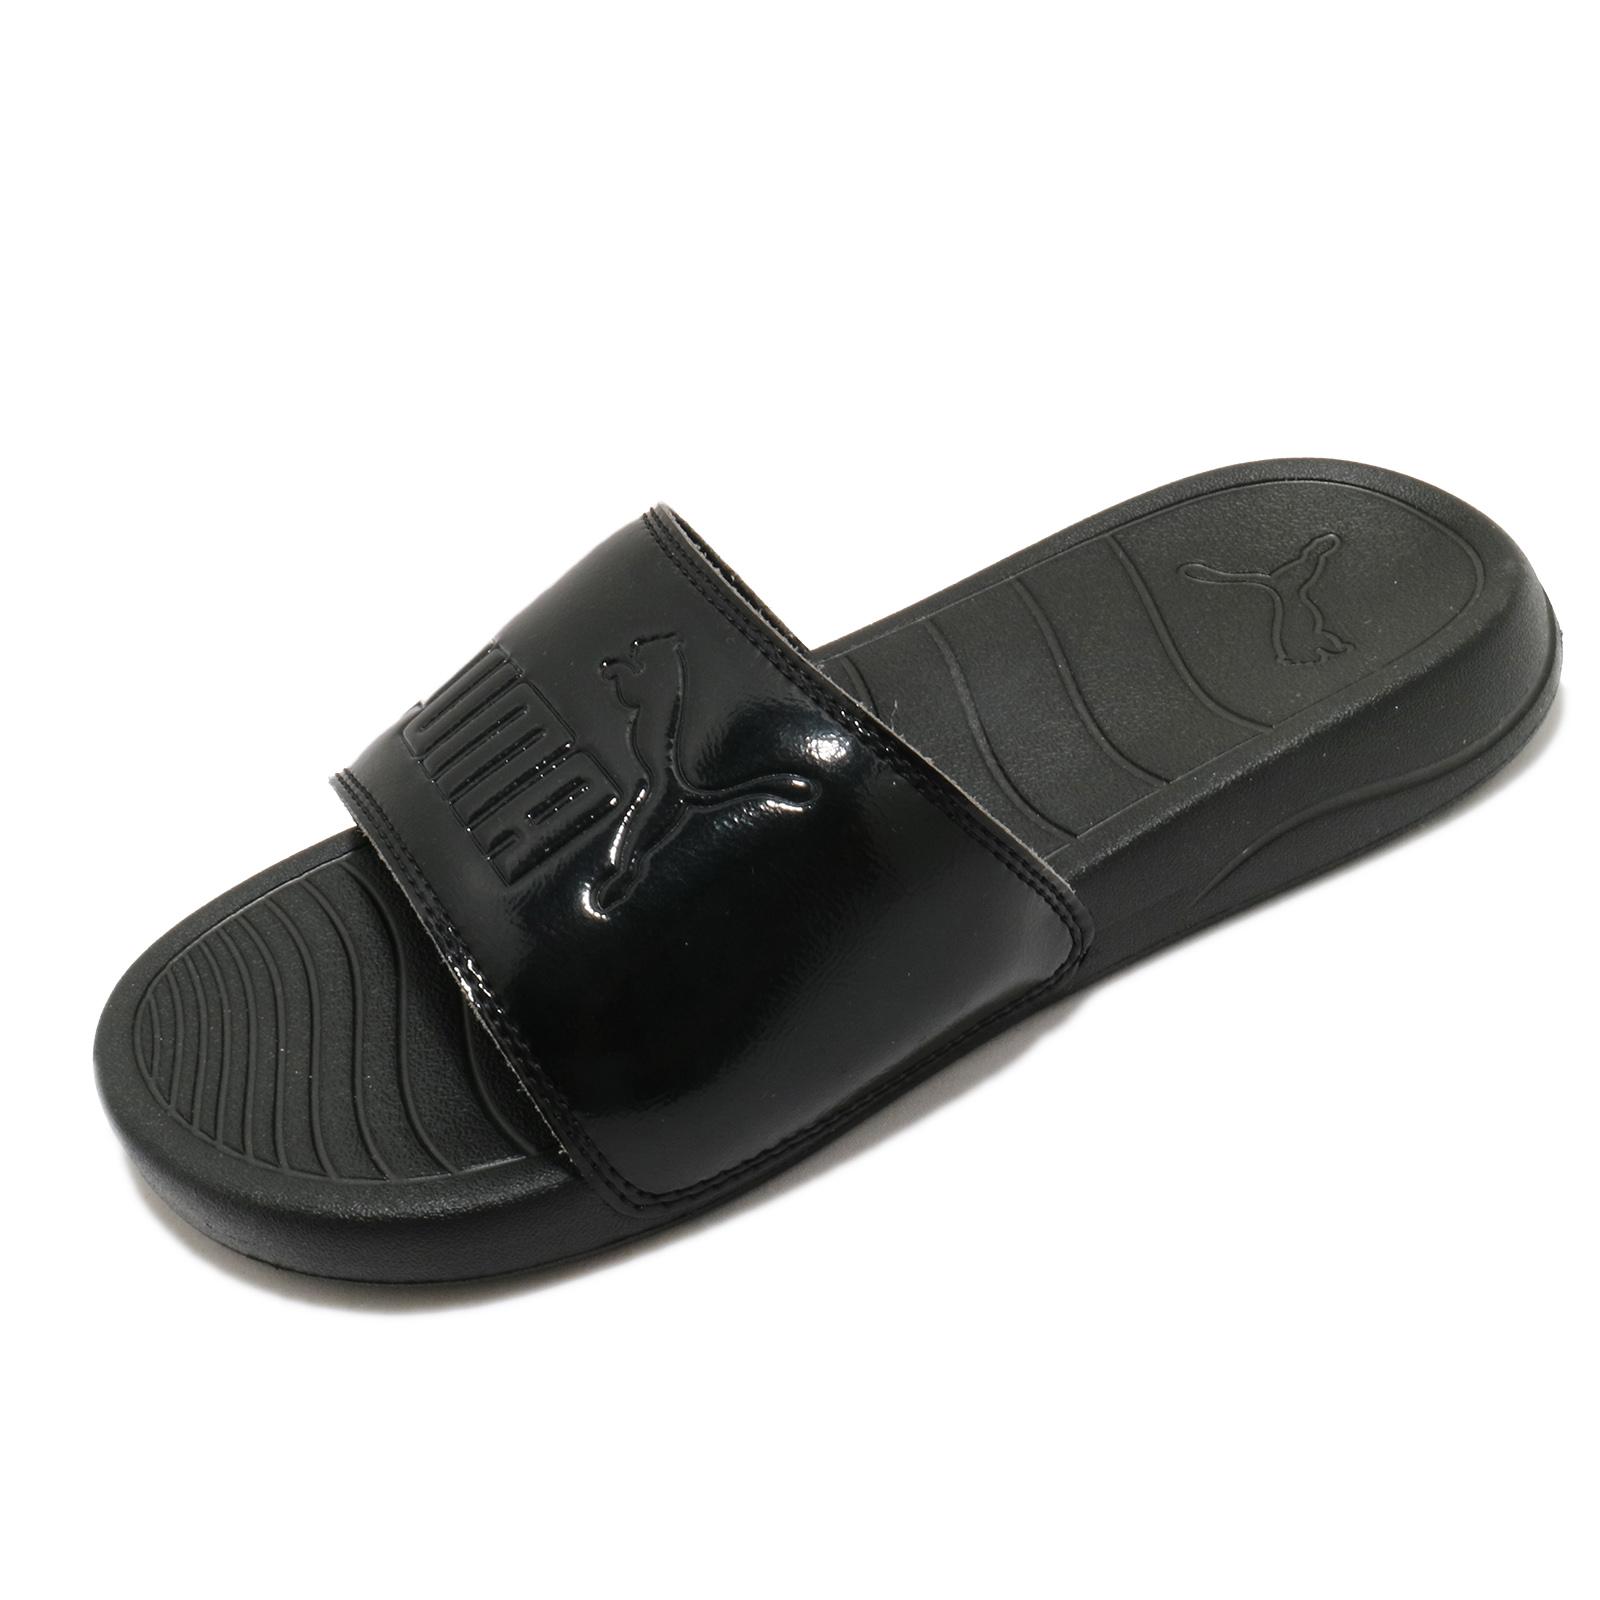 Puma 拖鞋 Popcat 20 Wns P 黑 全黑 漆皮 運動拖鞋 女鞋 【ACS】 374471-02